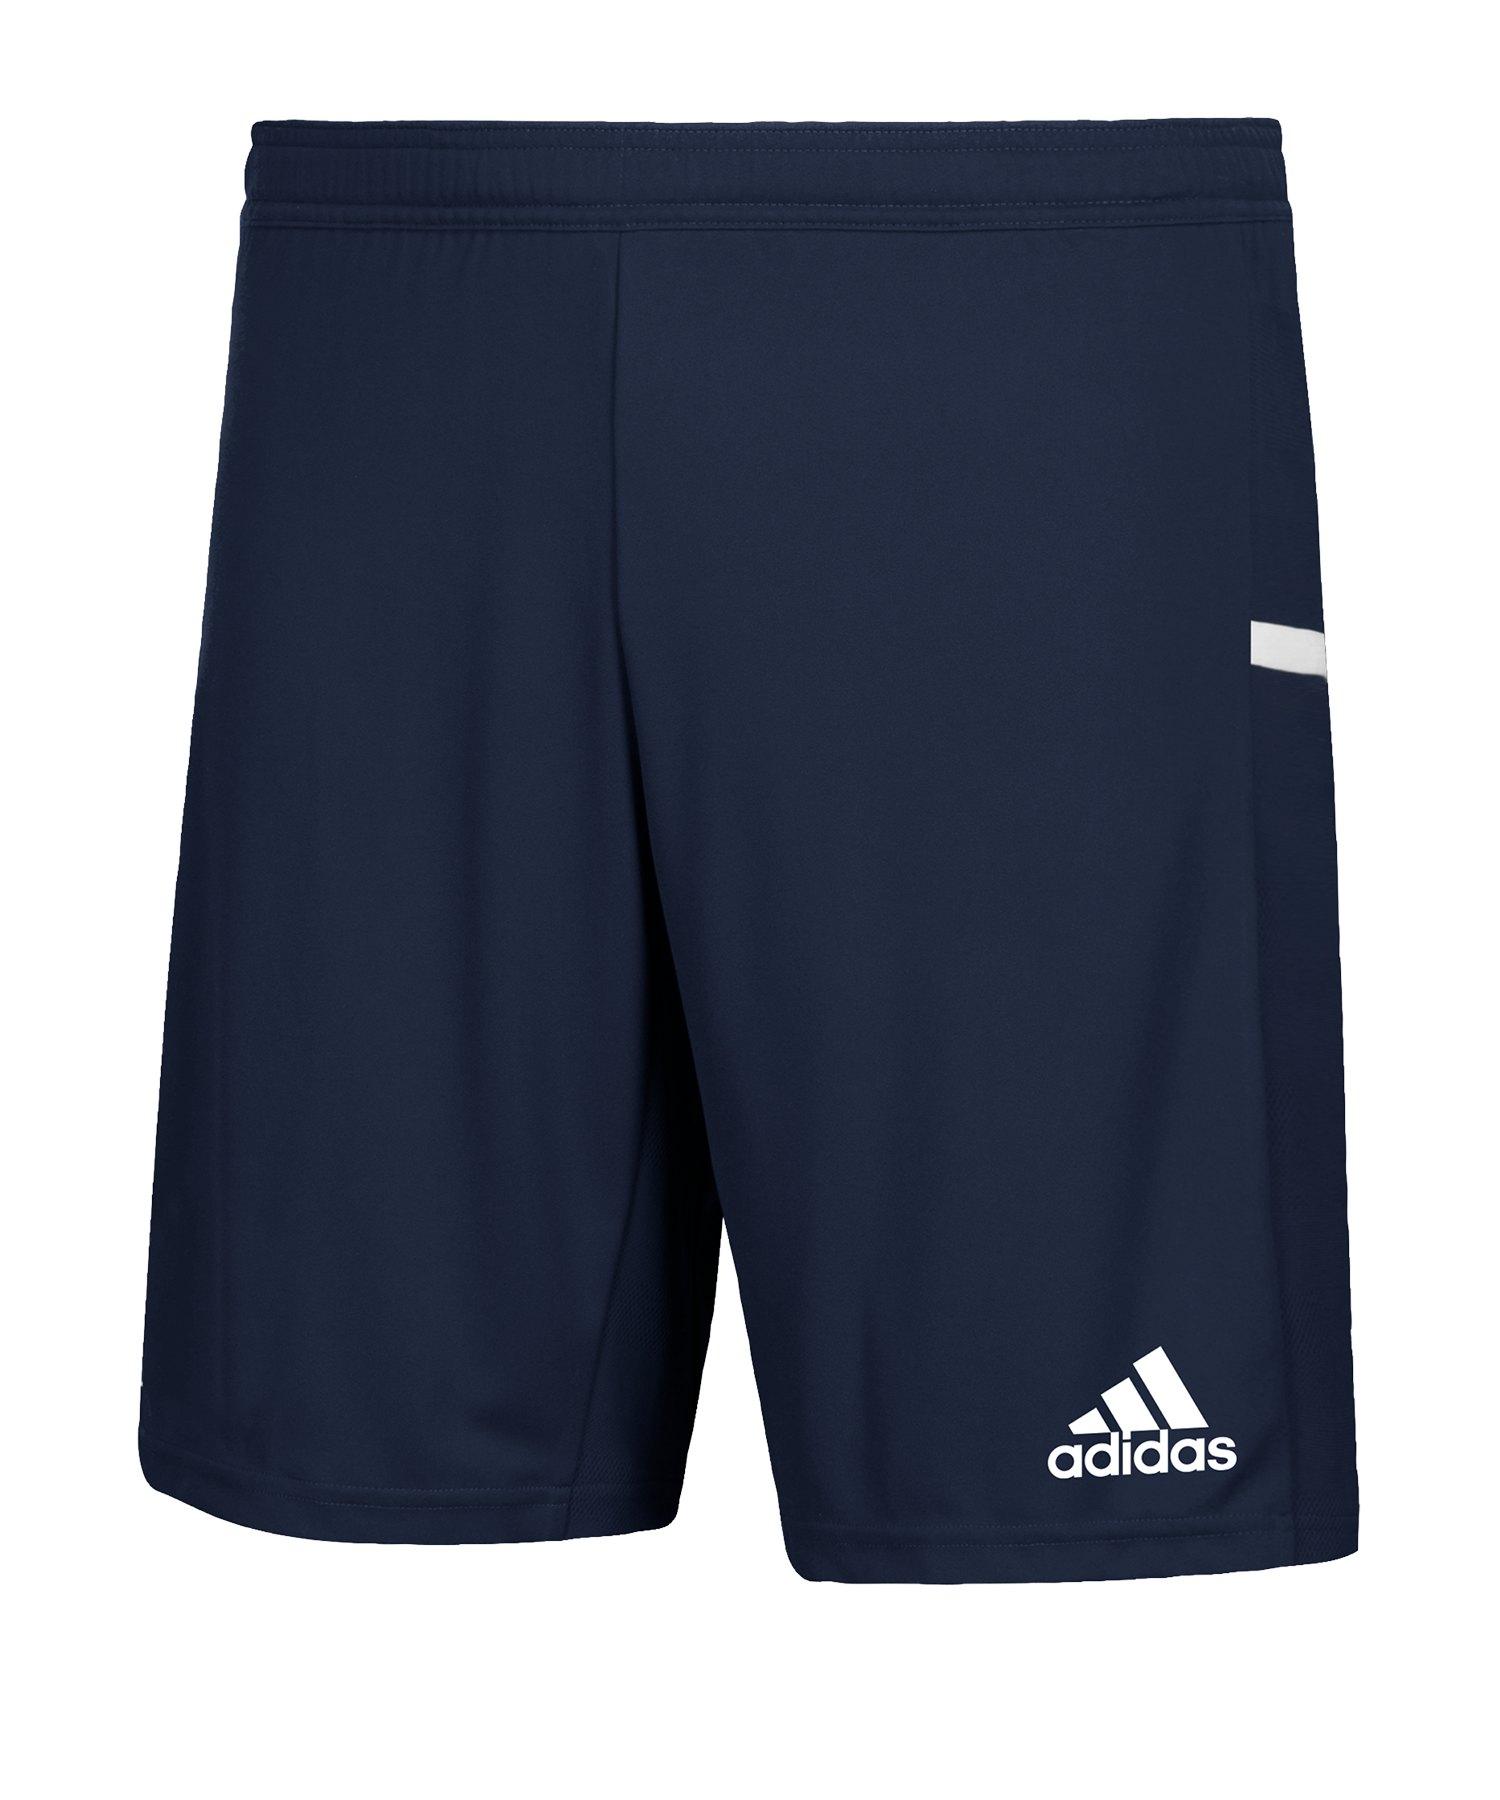 adidas Team 19 Knitted Short Kids Blau Weiss - blau